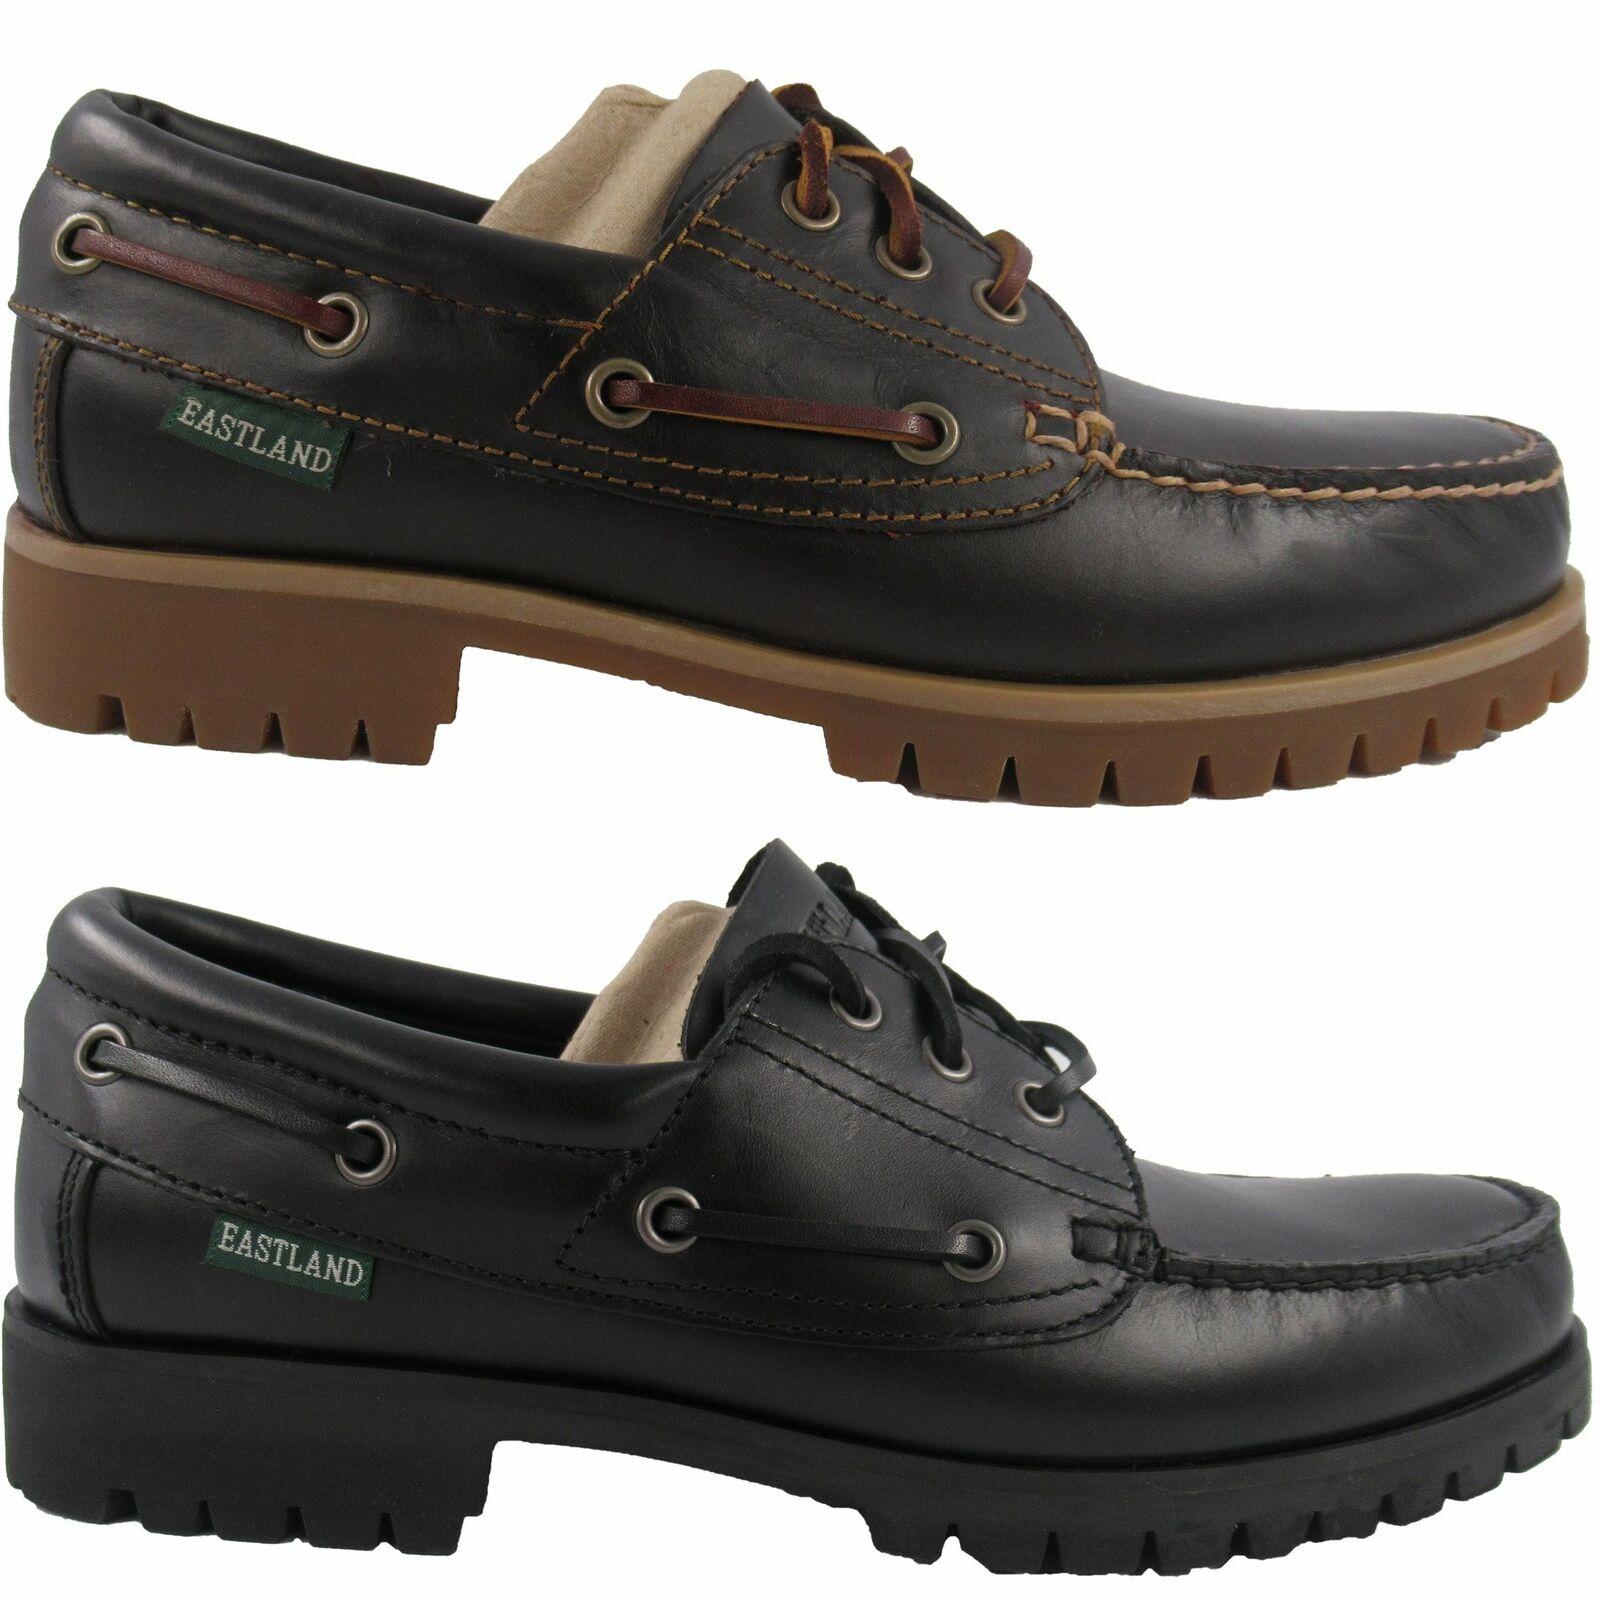 Mens Eastland Seville Classic Moc Toe Leather Oxford Shoes Black or Burgandy